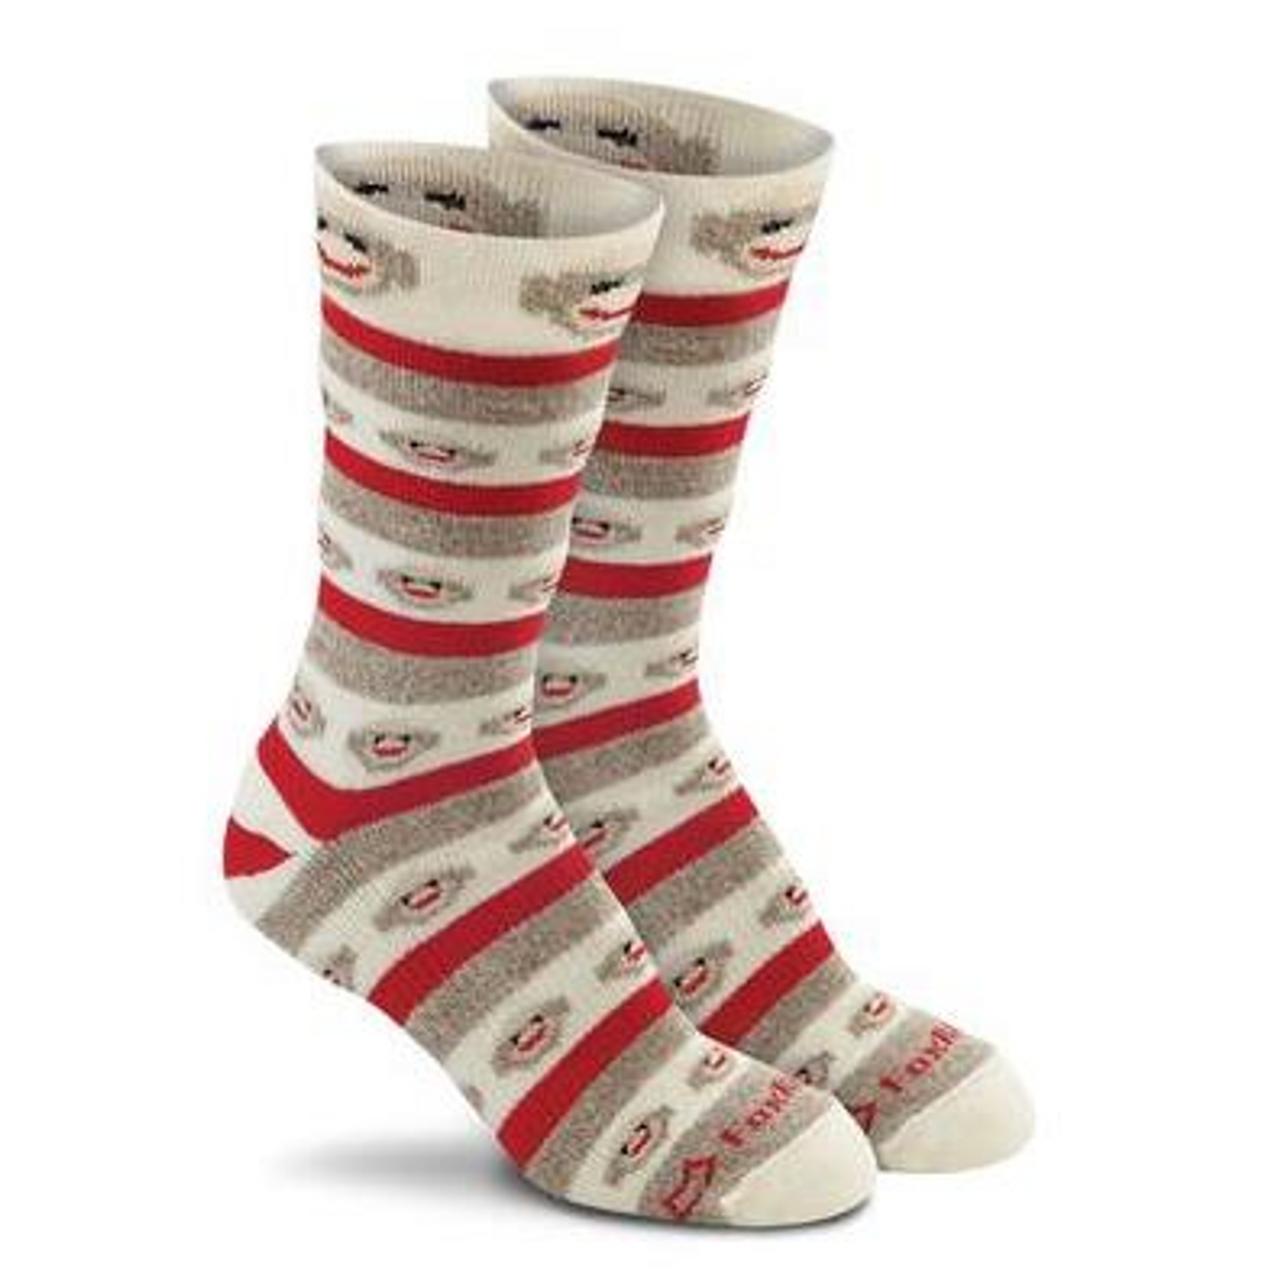 038a54a6747d4 Fox River MERINO STRIPES Rockford Red Heel Monkey Socks - SGT TROYS